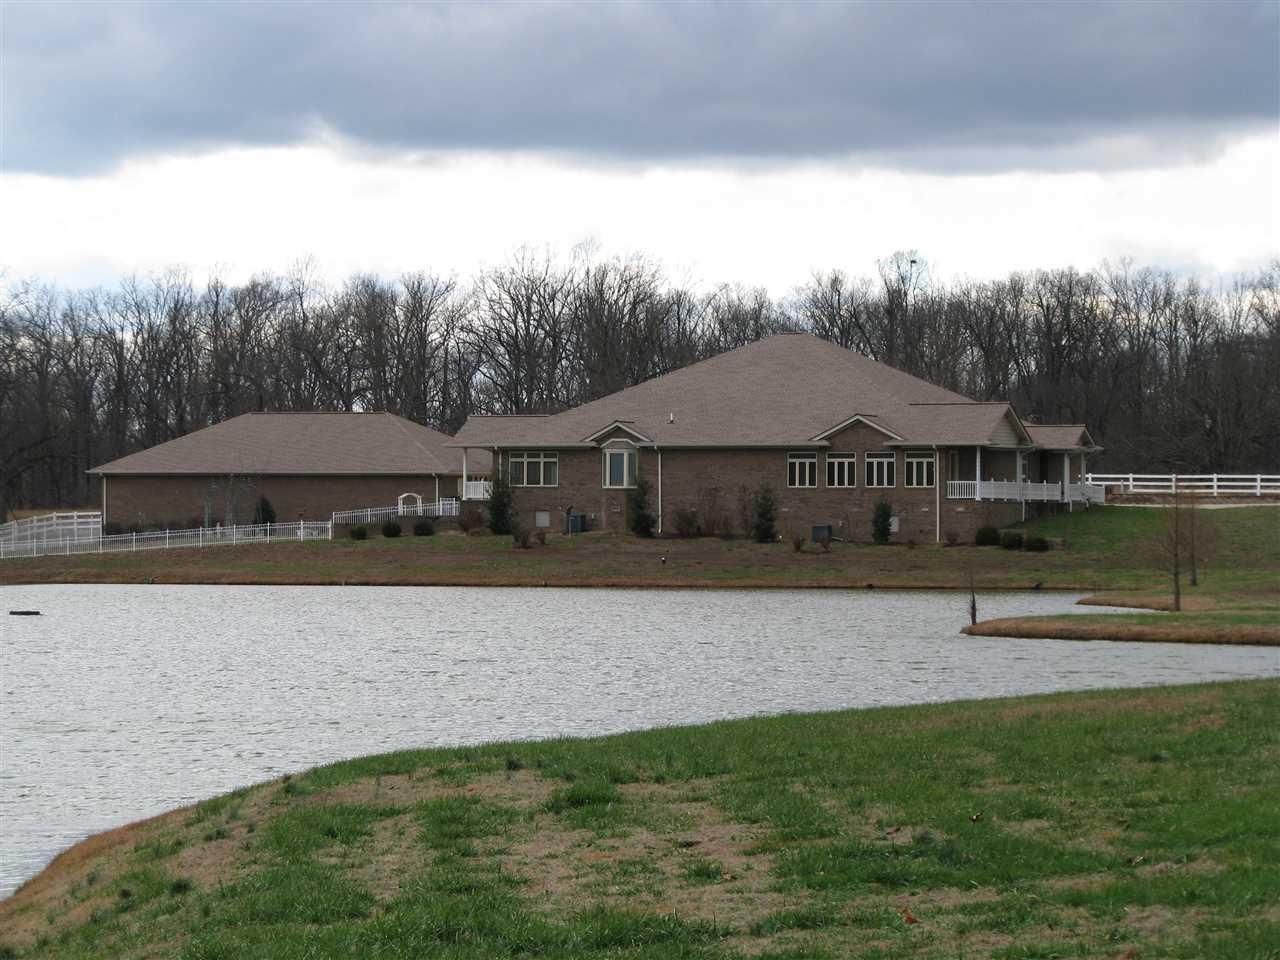 Real Estate for Sale, ListingId: 36576410, Benton,KY42025